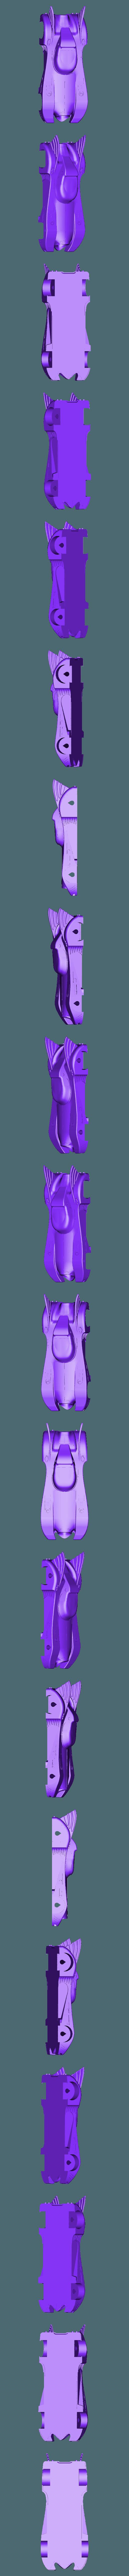 Batmobile 1989 Body.stl Download free STL file 1989 mini Batmobile • 3D printable model, Dsk